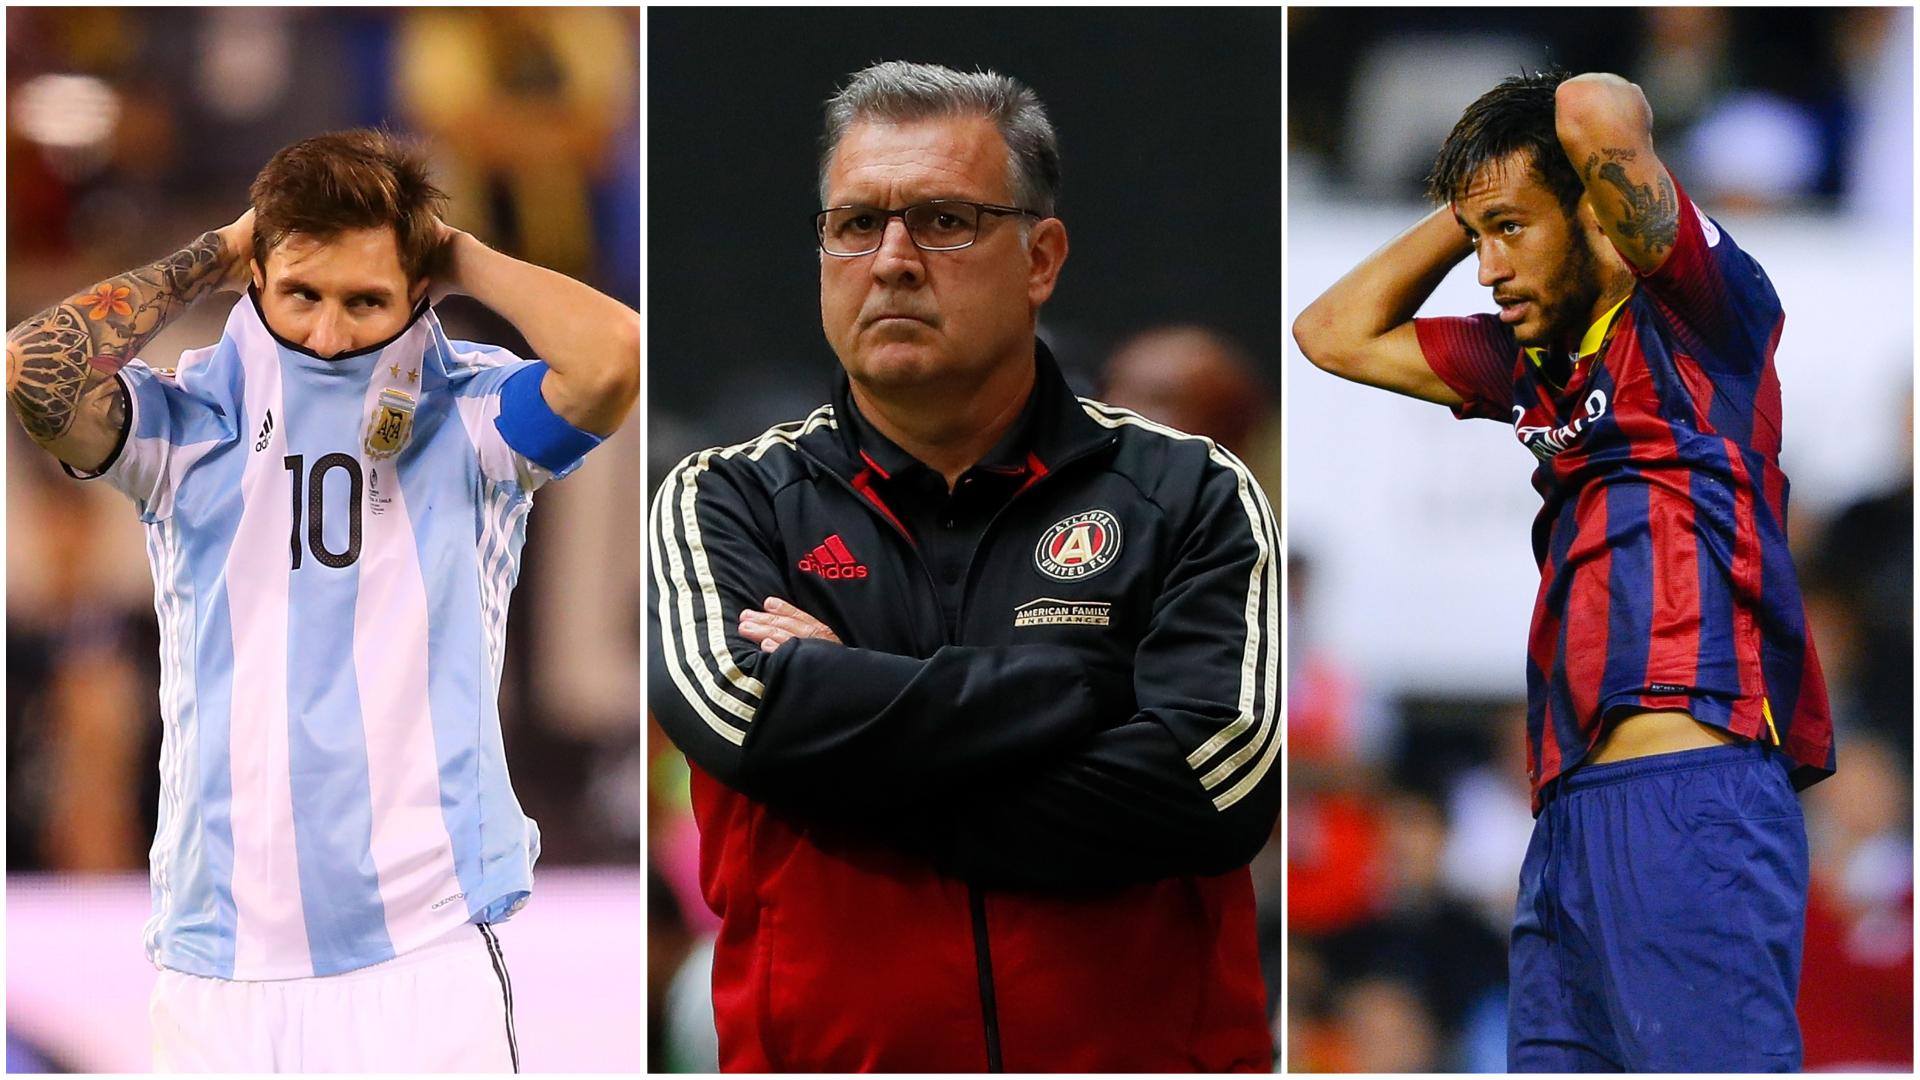 MLS Cup: Atlanta United boss Martino's disheartening record in finals